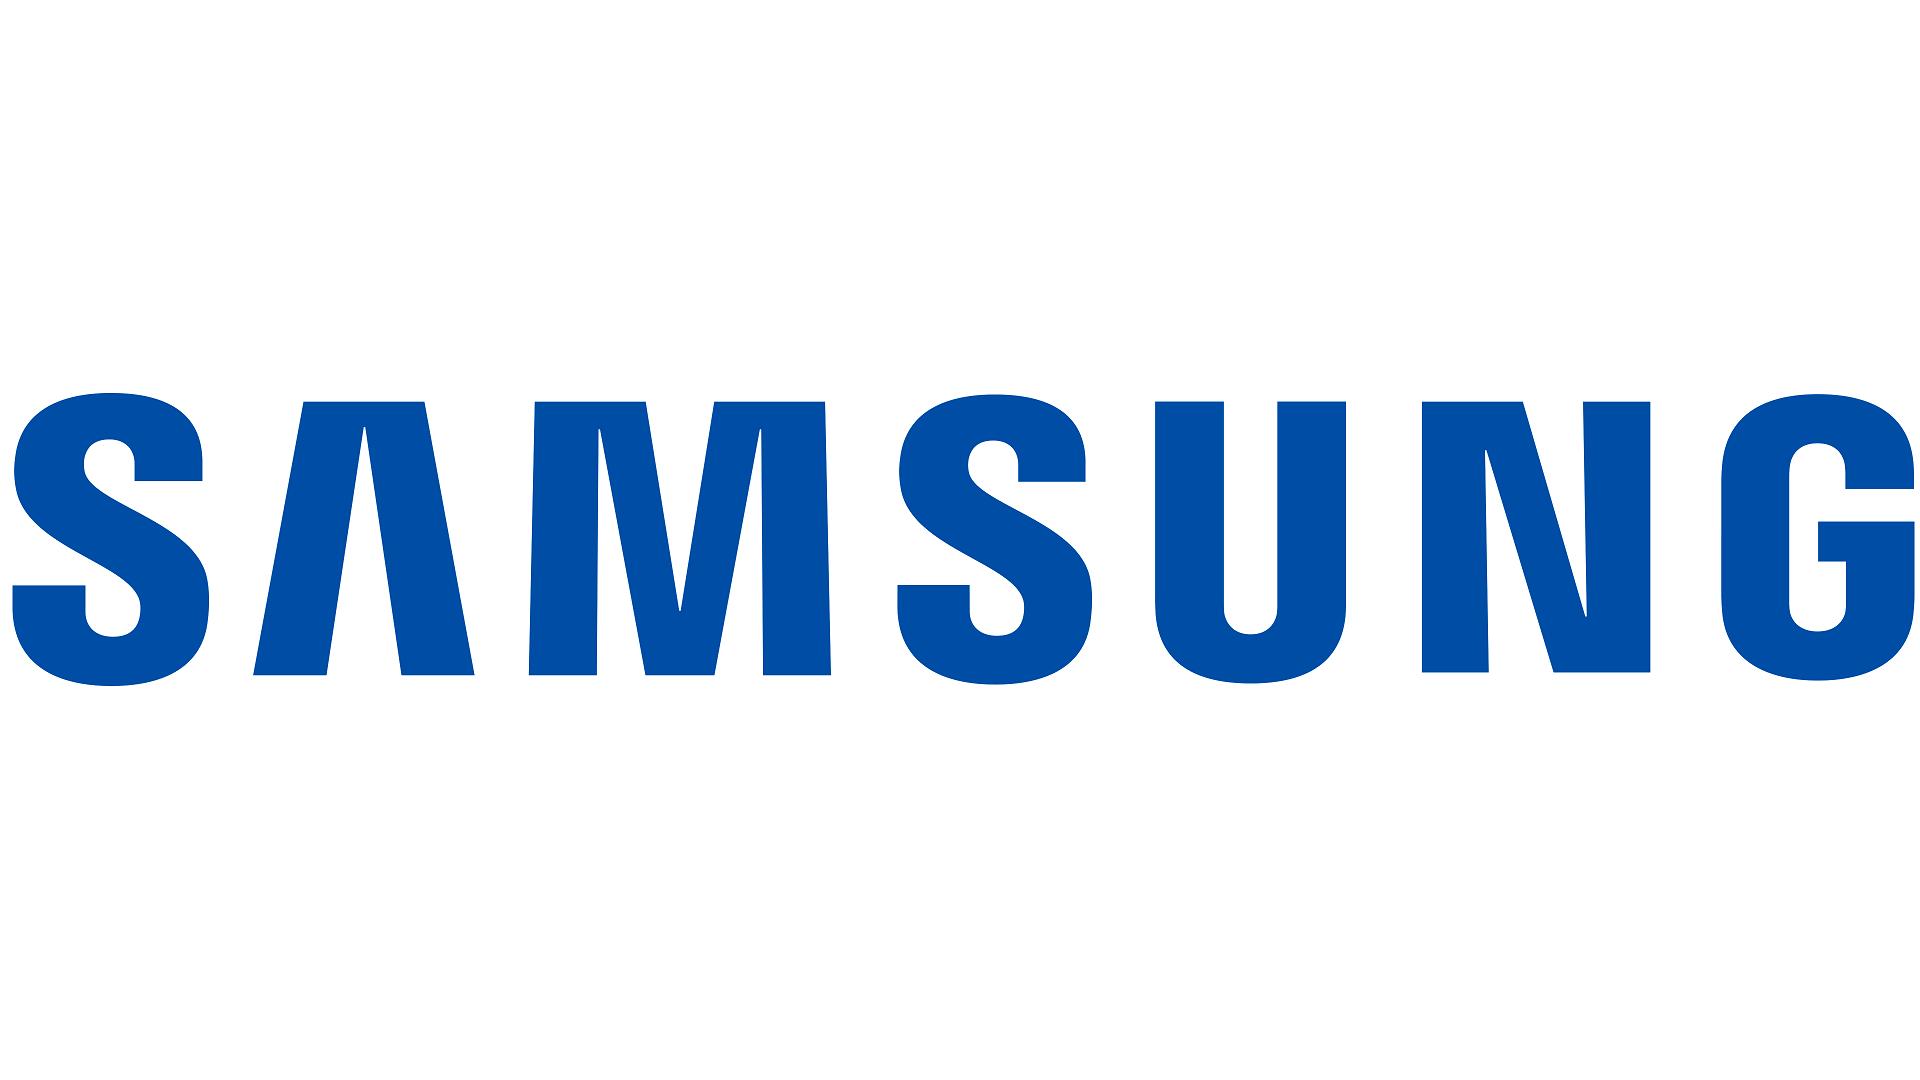 Samsungが世界初の5nm採用ウェアラブル向けSoC、Exynos W920を発表